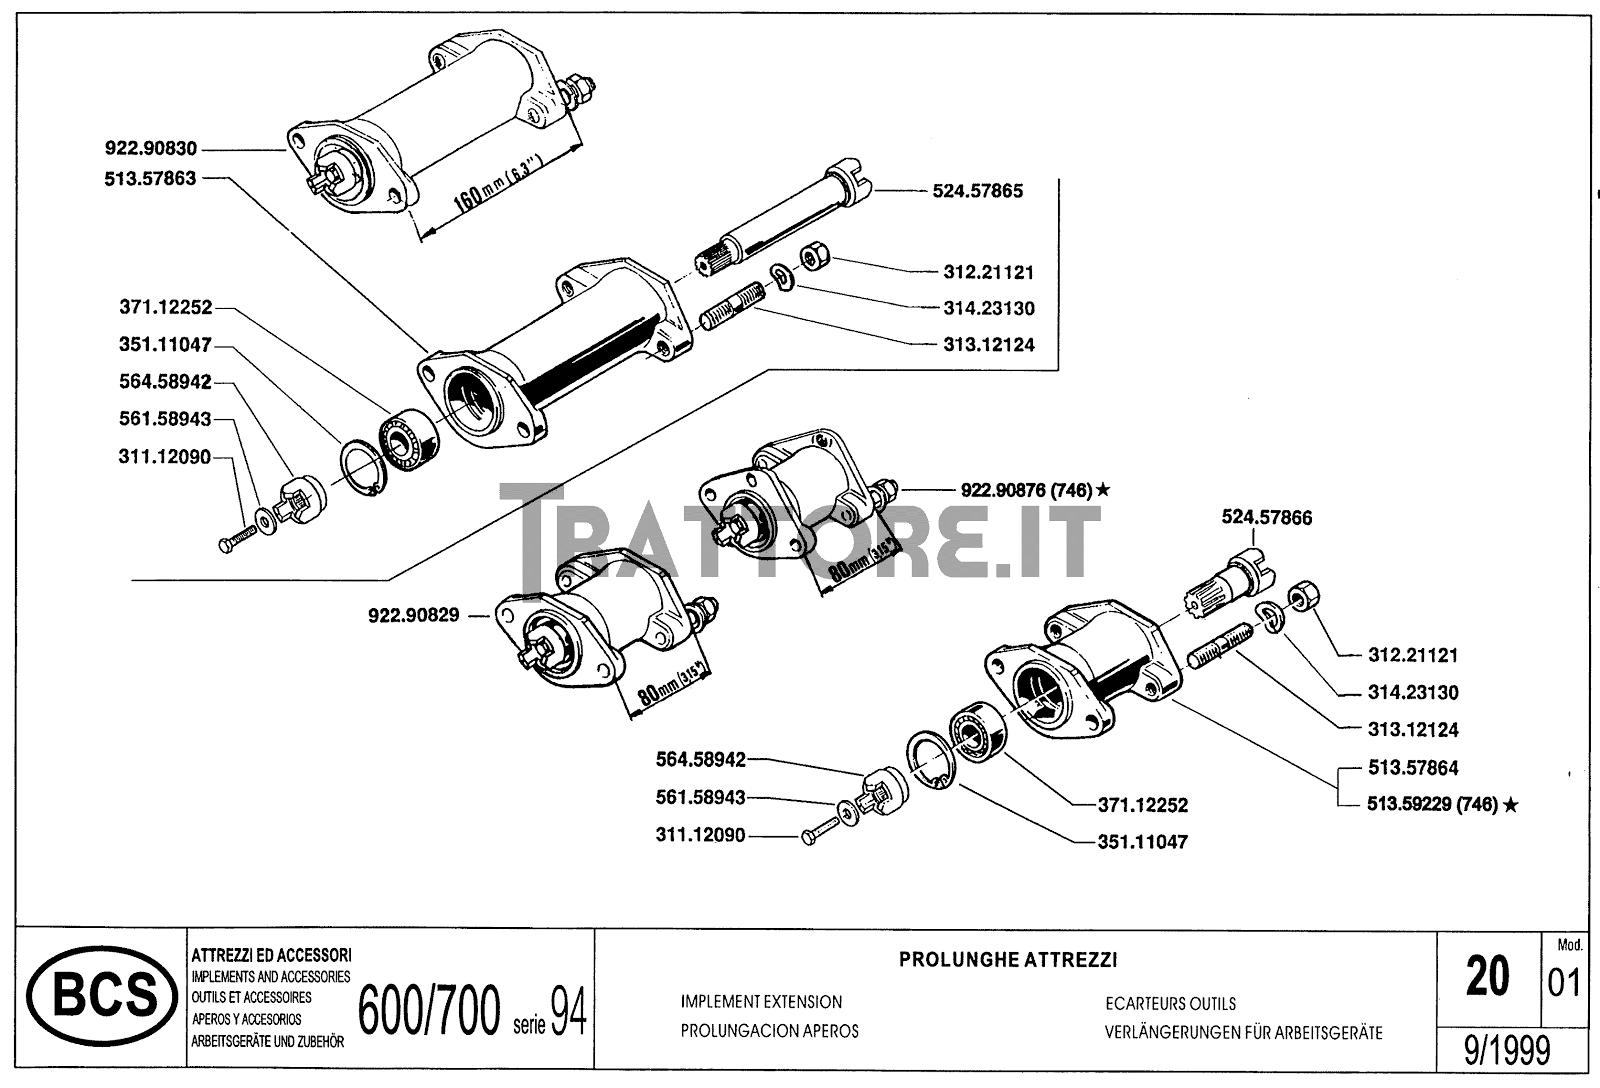 InfoTrattore.it: Manuale (esploso meccanico) serie BCS 600